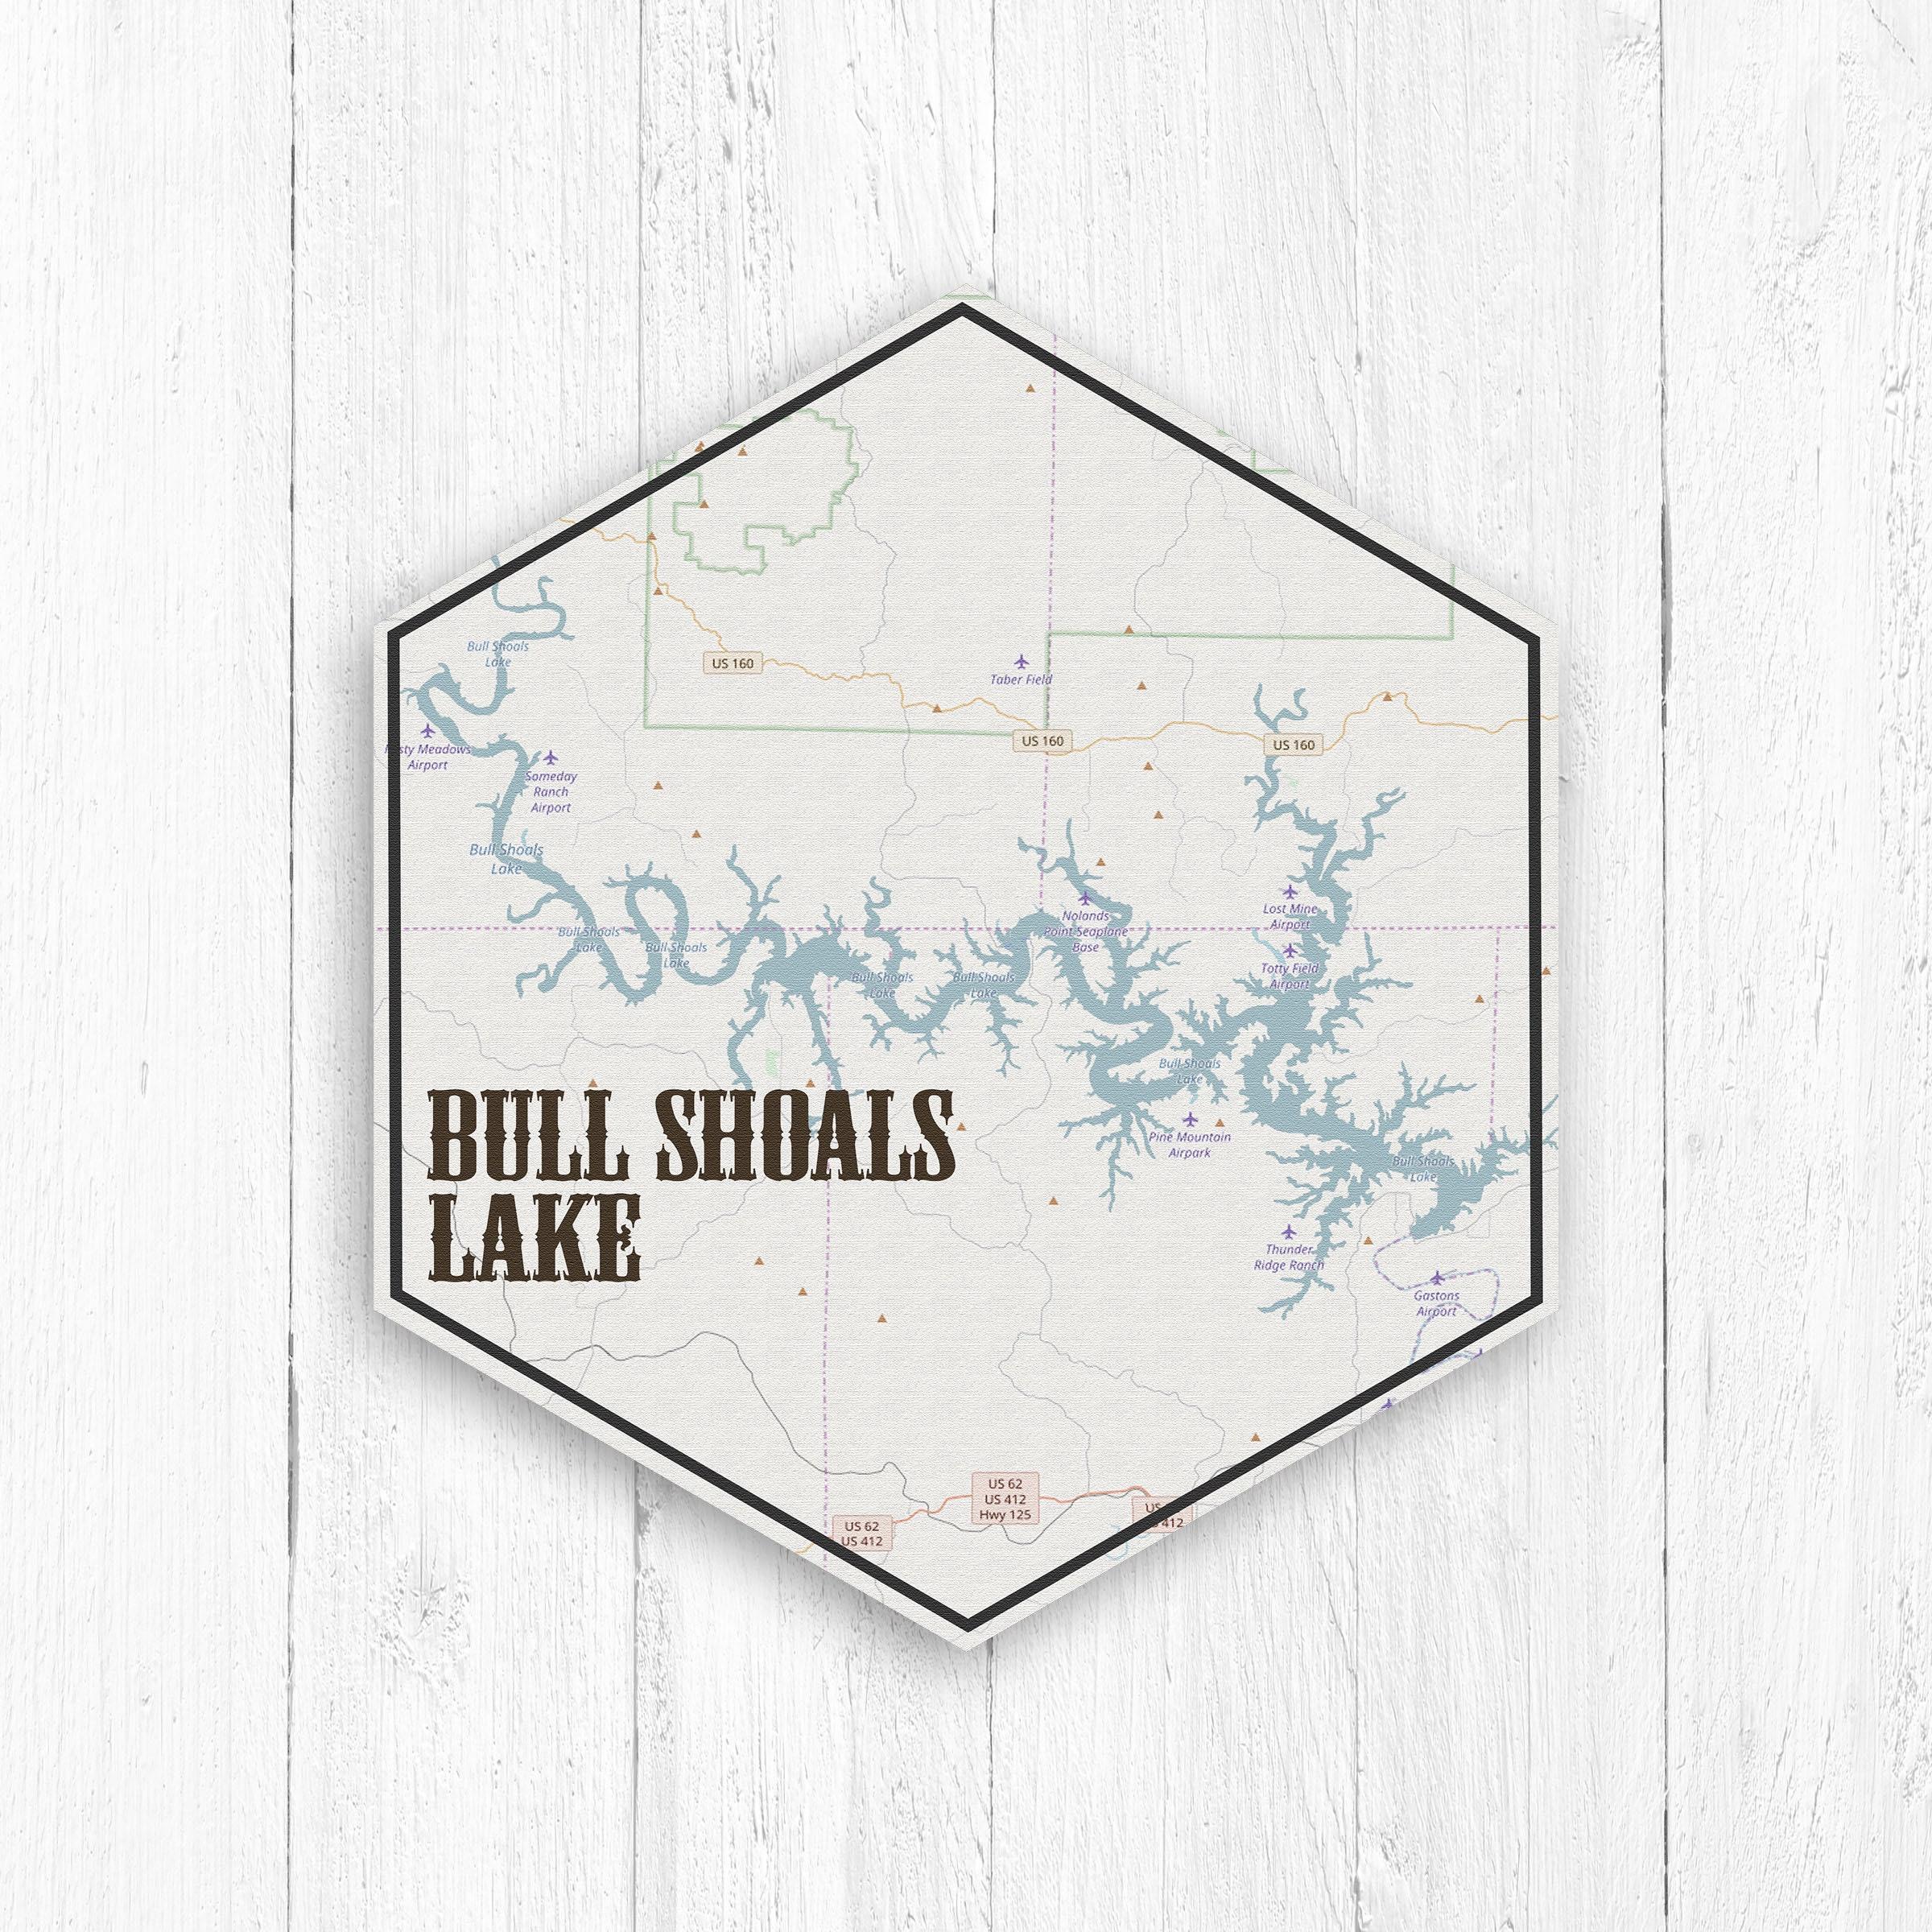 Bull Shoals Lake Hexagon Canvas, Bull Shoals Lake Map Print ...